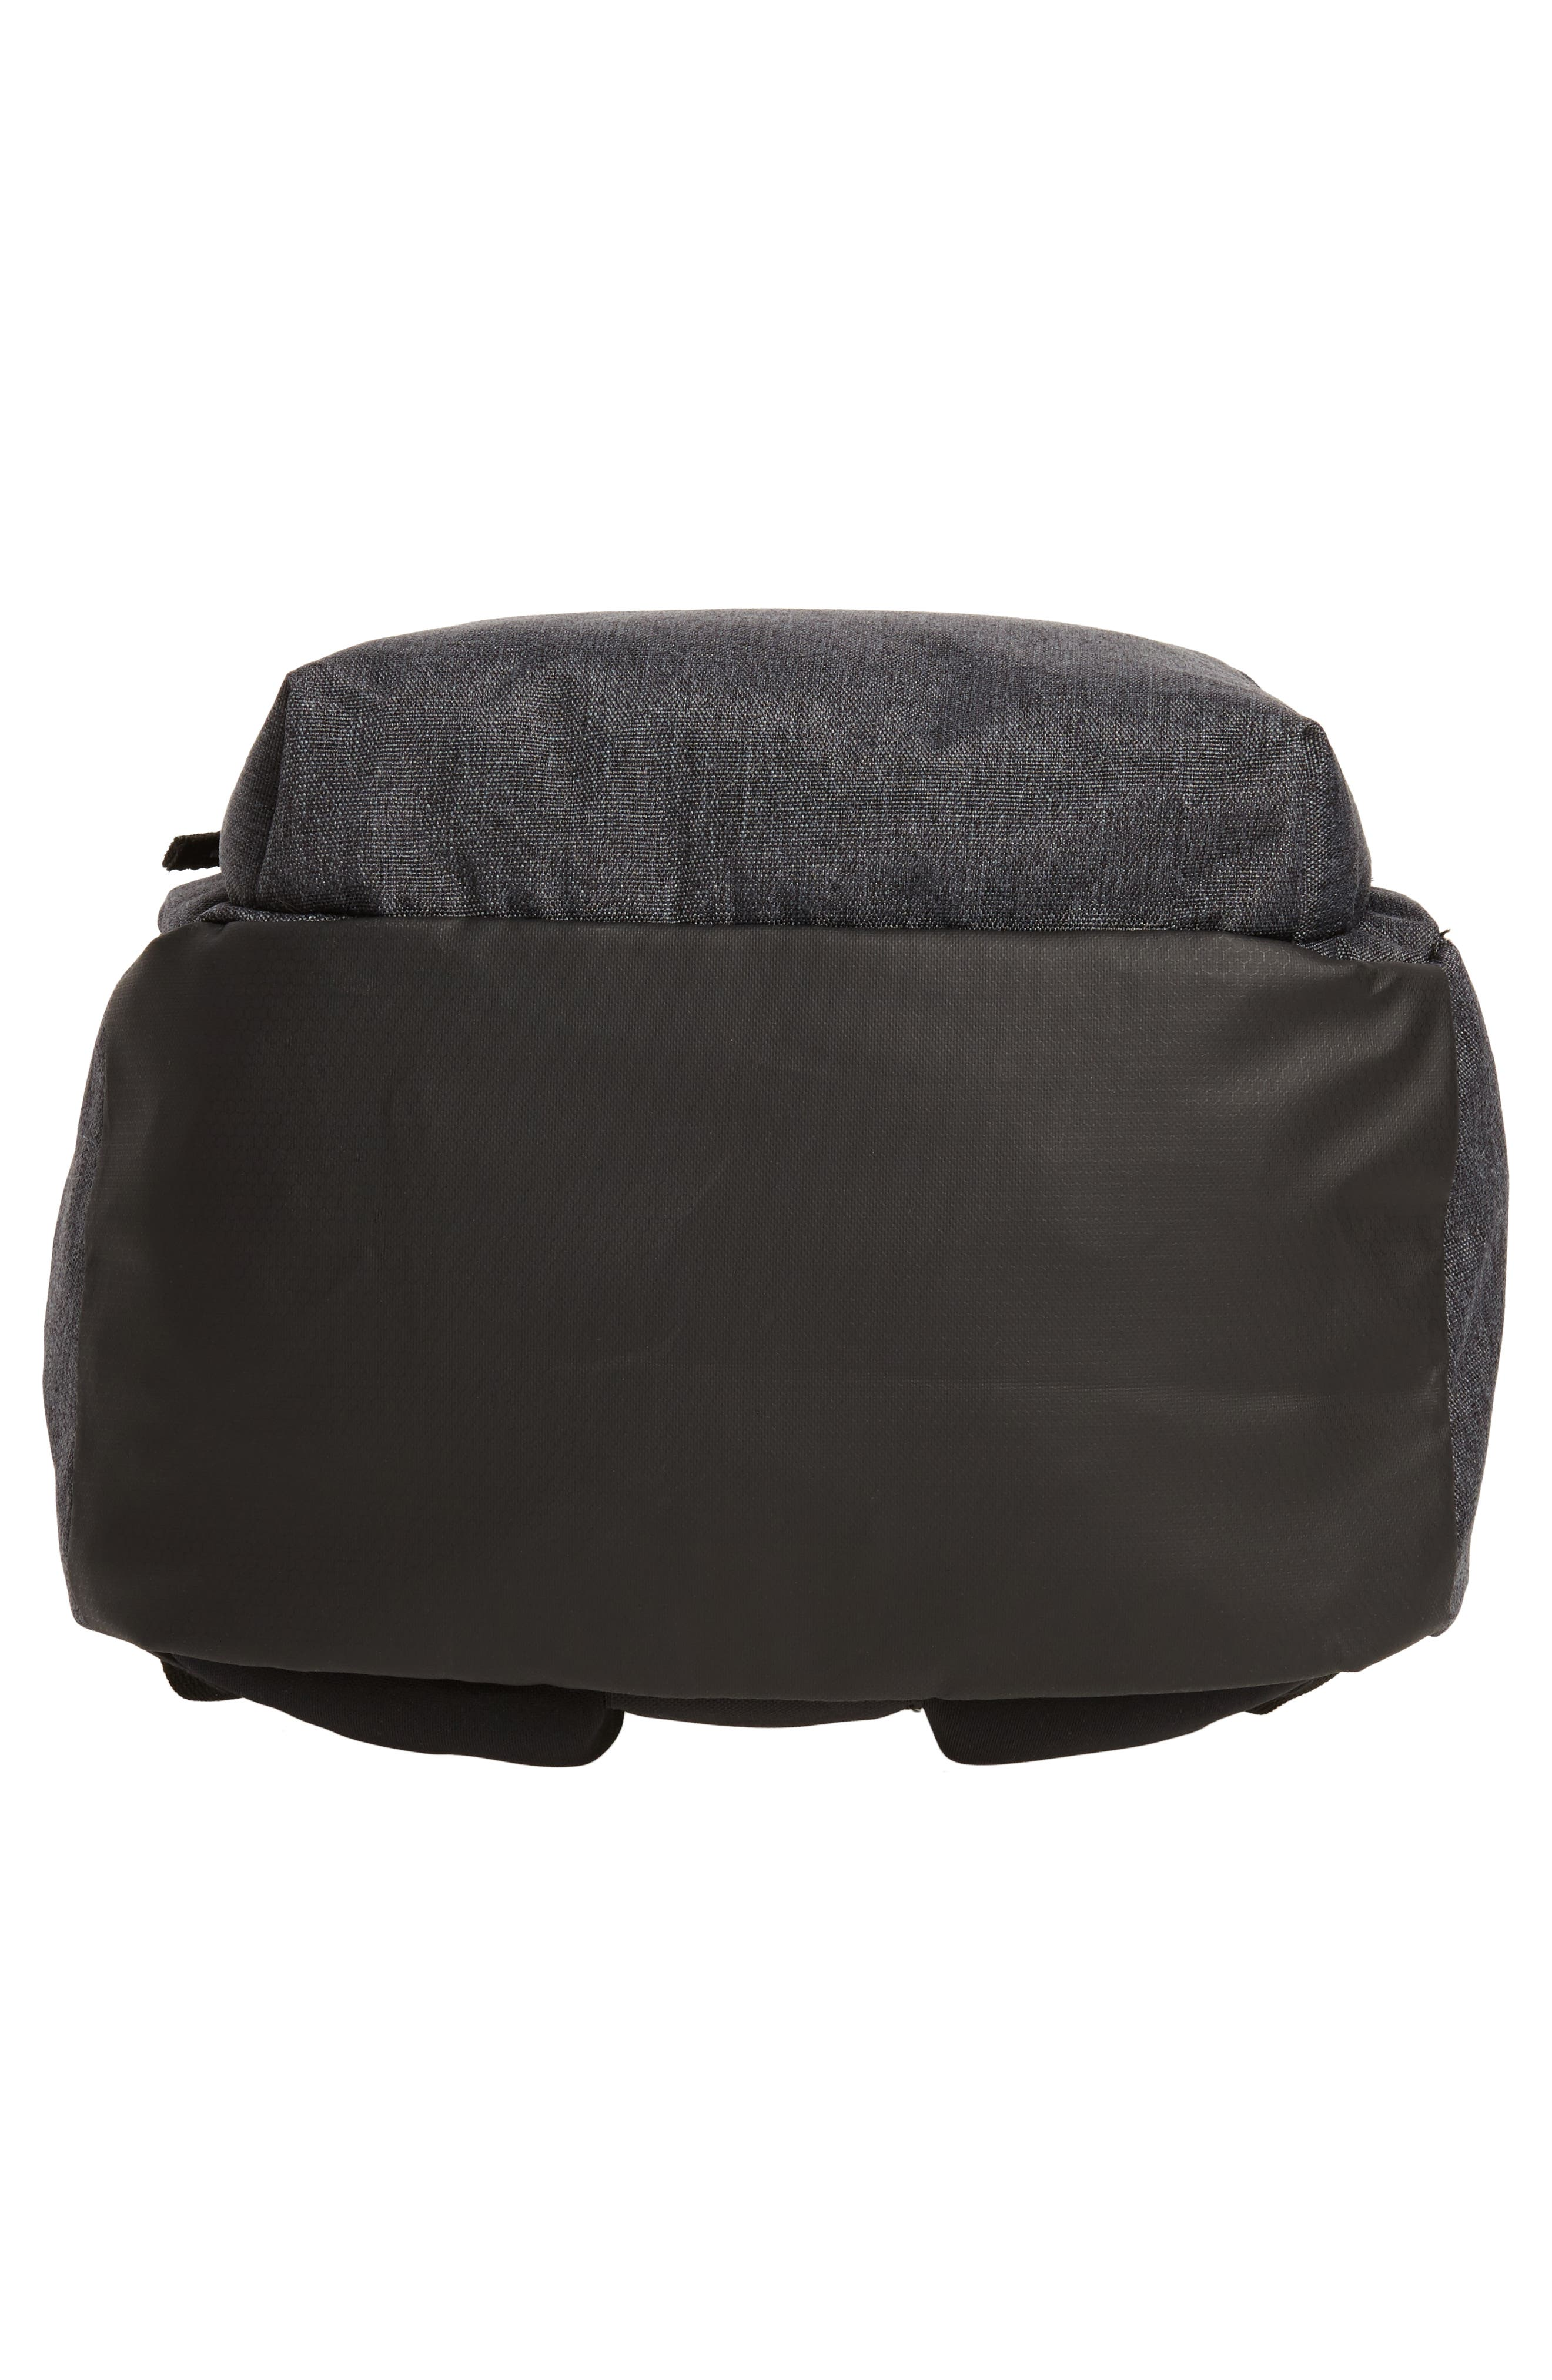 National Plus Backpack,                             Alternate thumbnail 6, color,                             BLACK/ GREY HEATHER/ WHITE